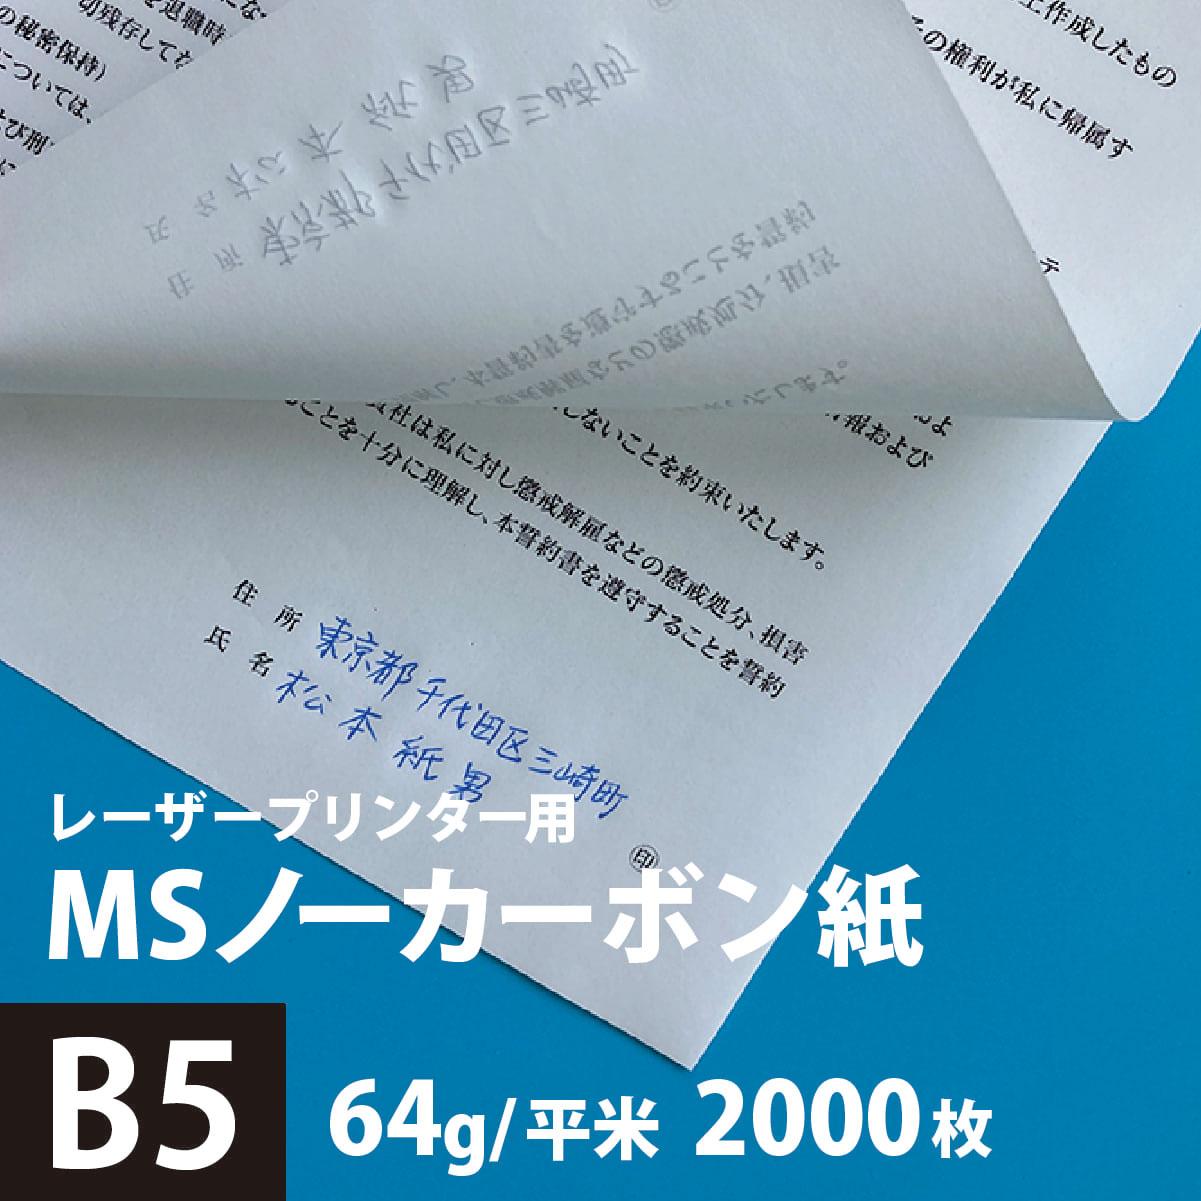 MSノーカーボン紙N50 64g/平米 B5サイズ:2000枚, 複写 印刷紙 印刷用紙 複写紙 レーザープリンター用 複写用伝票用紙 伝票印刷 複写用紙 帳票作成 メモ用紙 領収書印刷 松本洋紙店